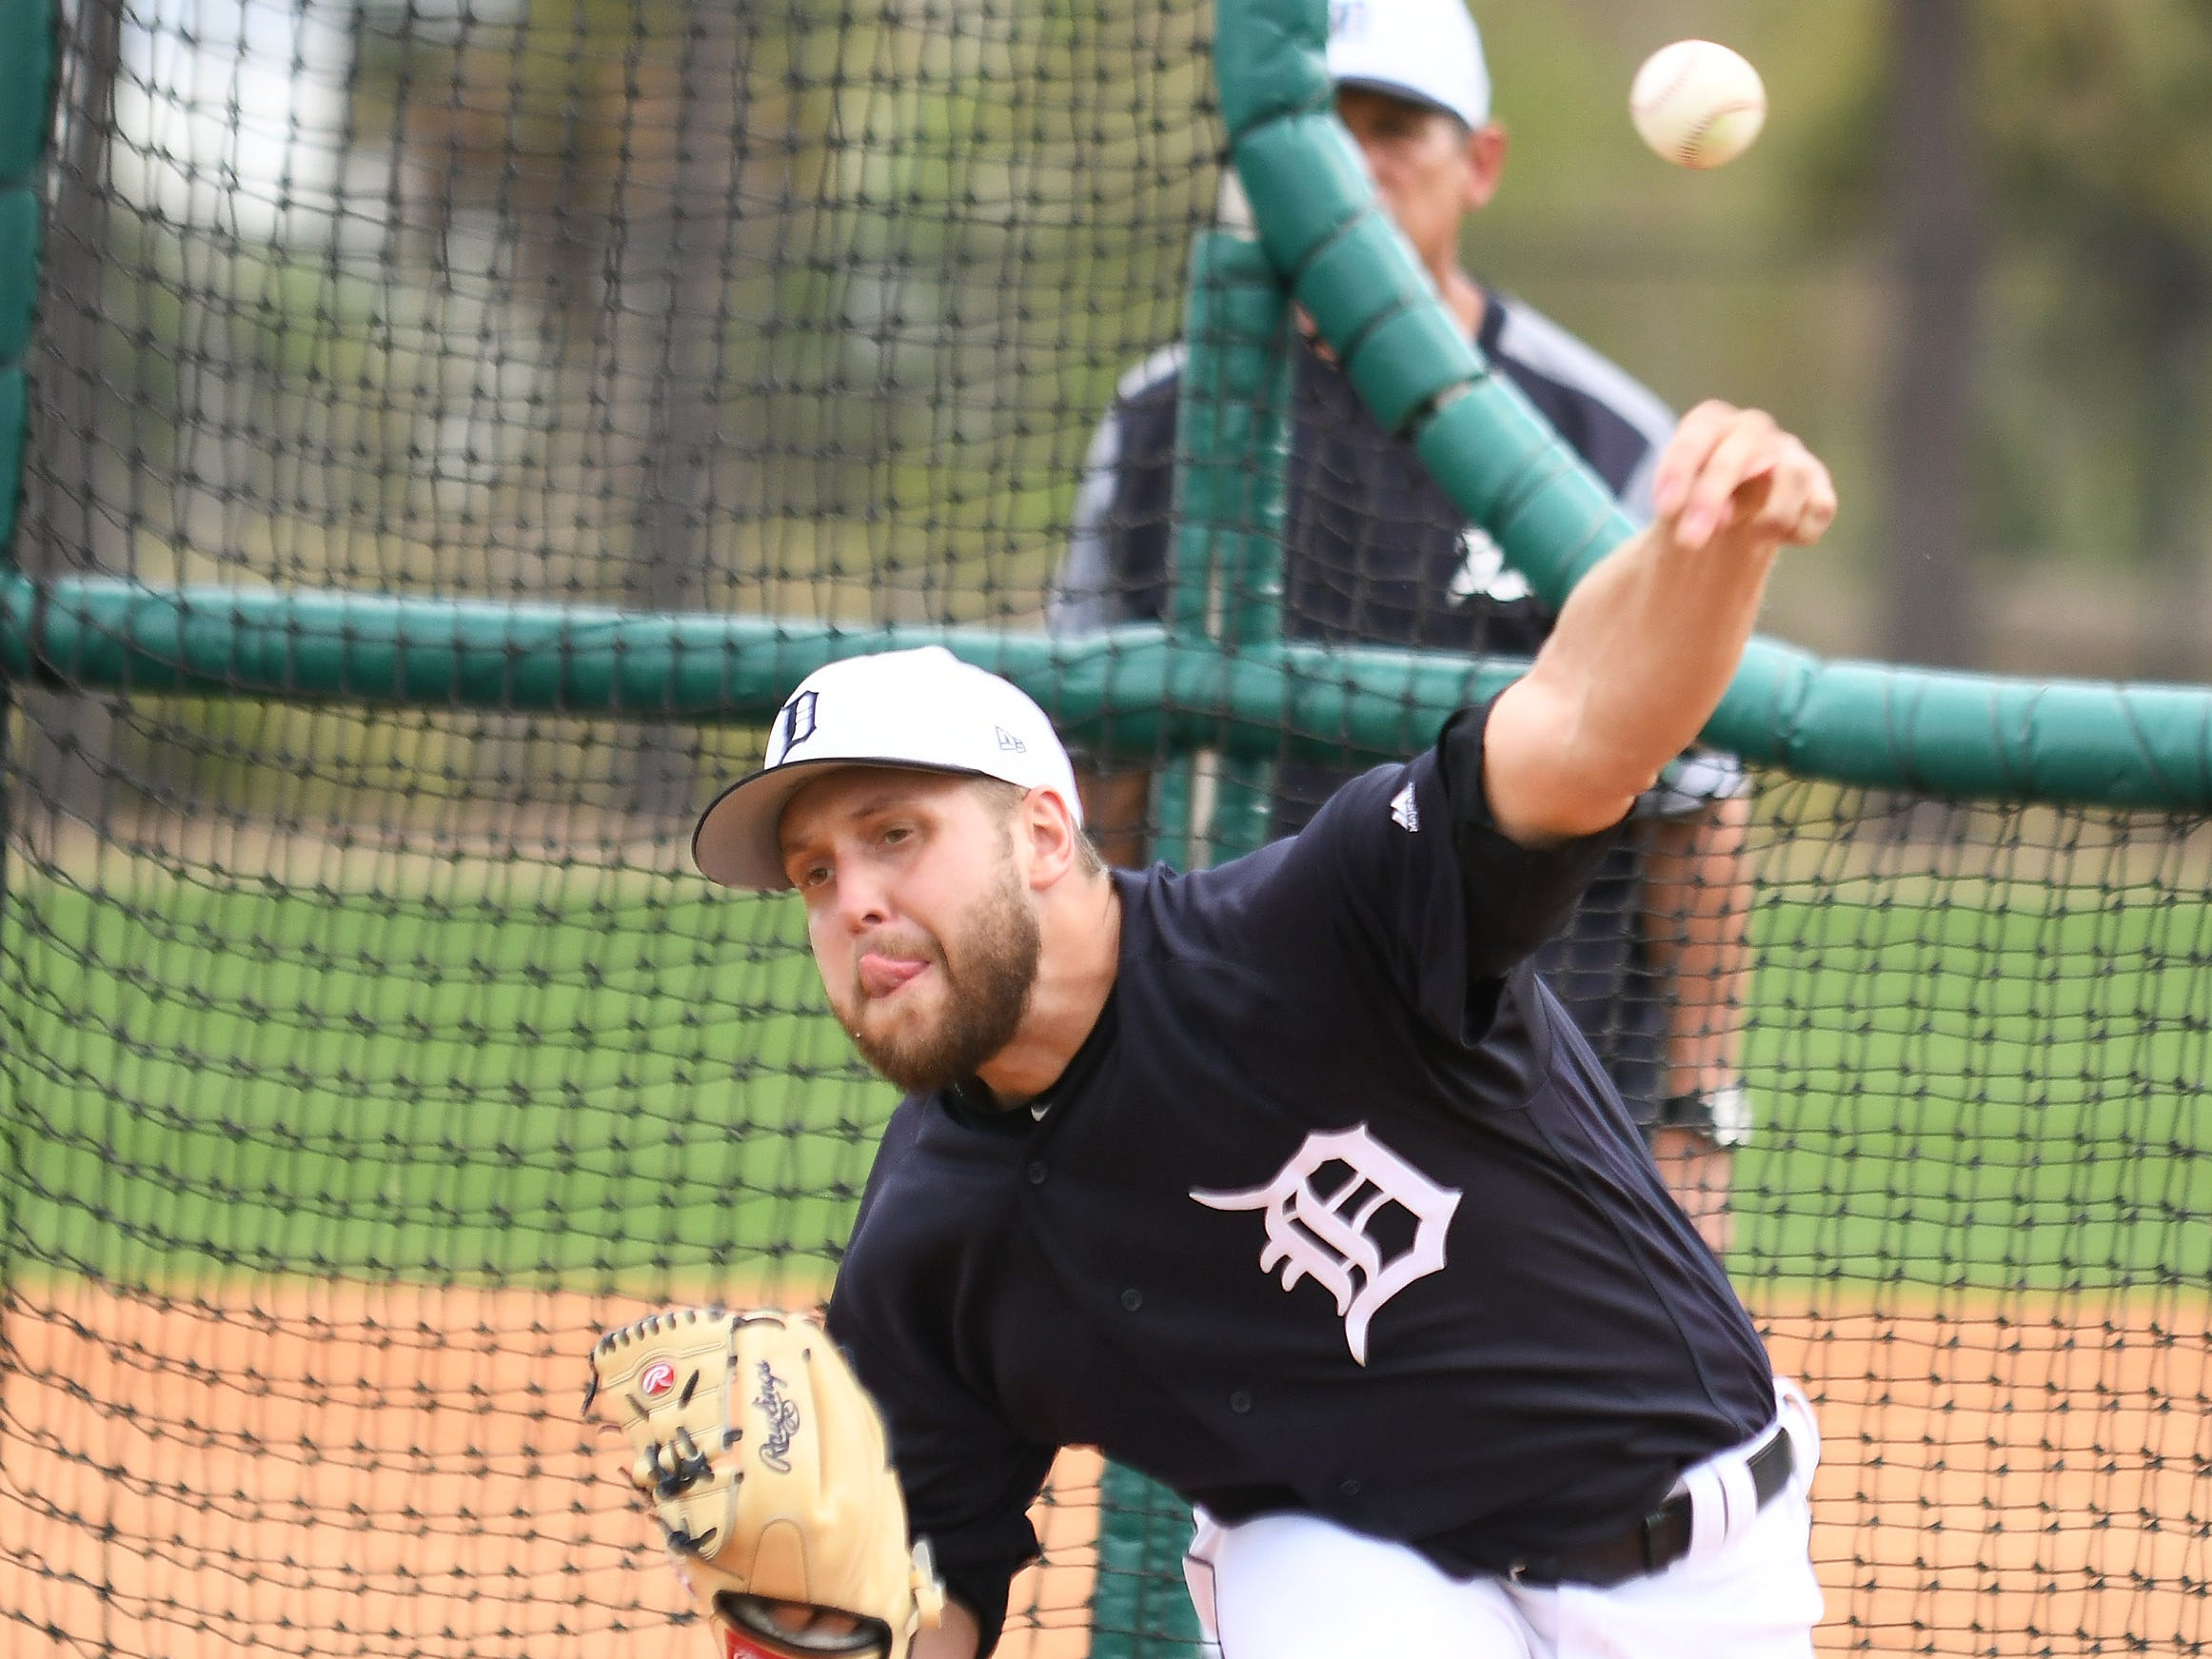 Tigers pitcher Matt Hall throws live batting practice.